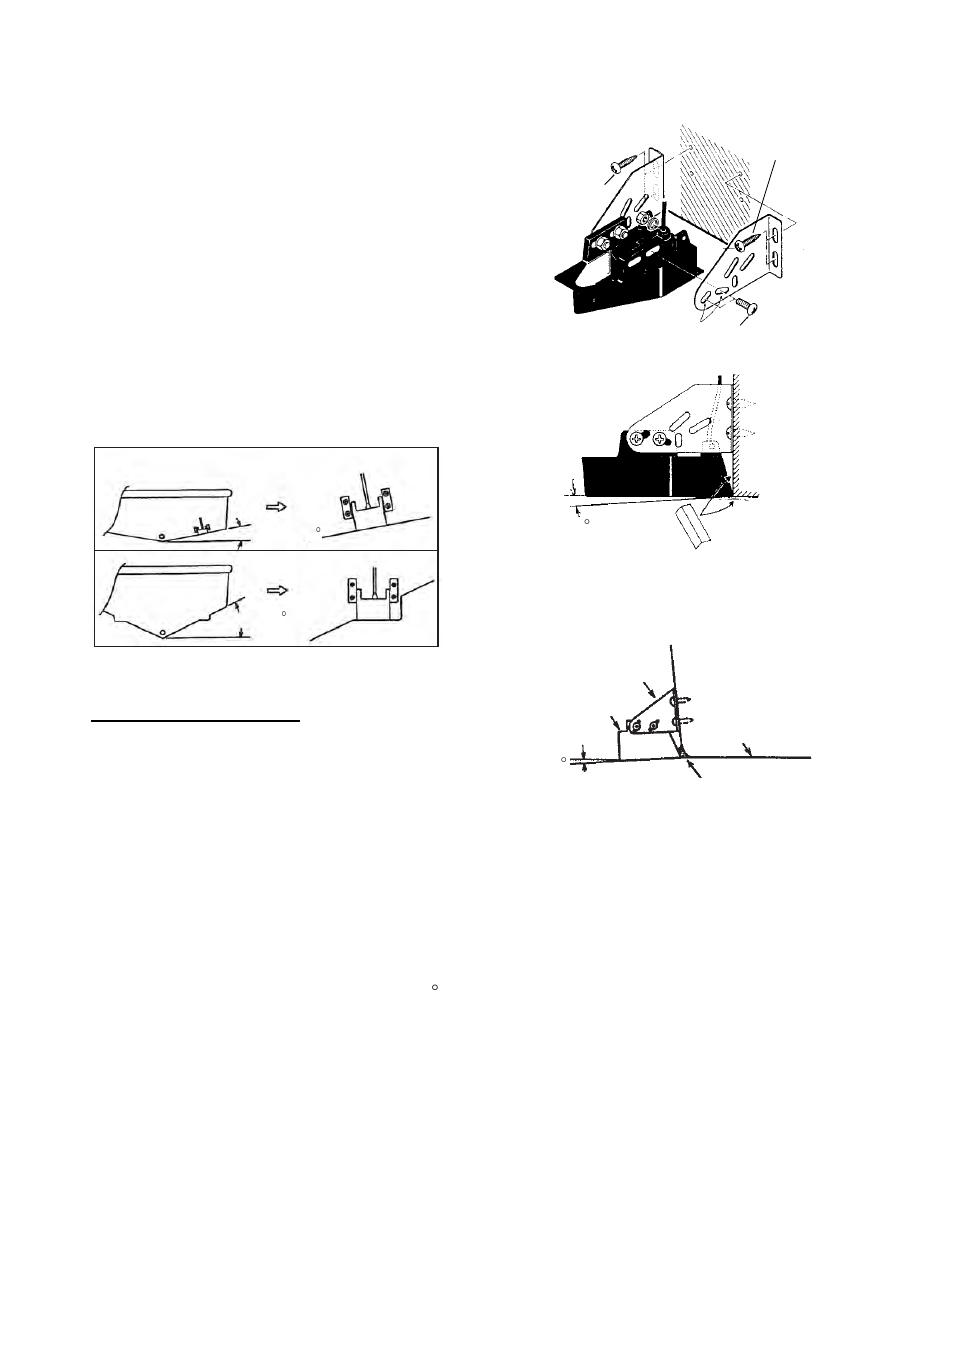 3 transom mount transducer, 4 inside-hull transducer